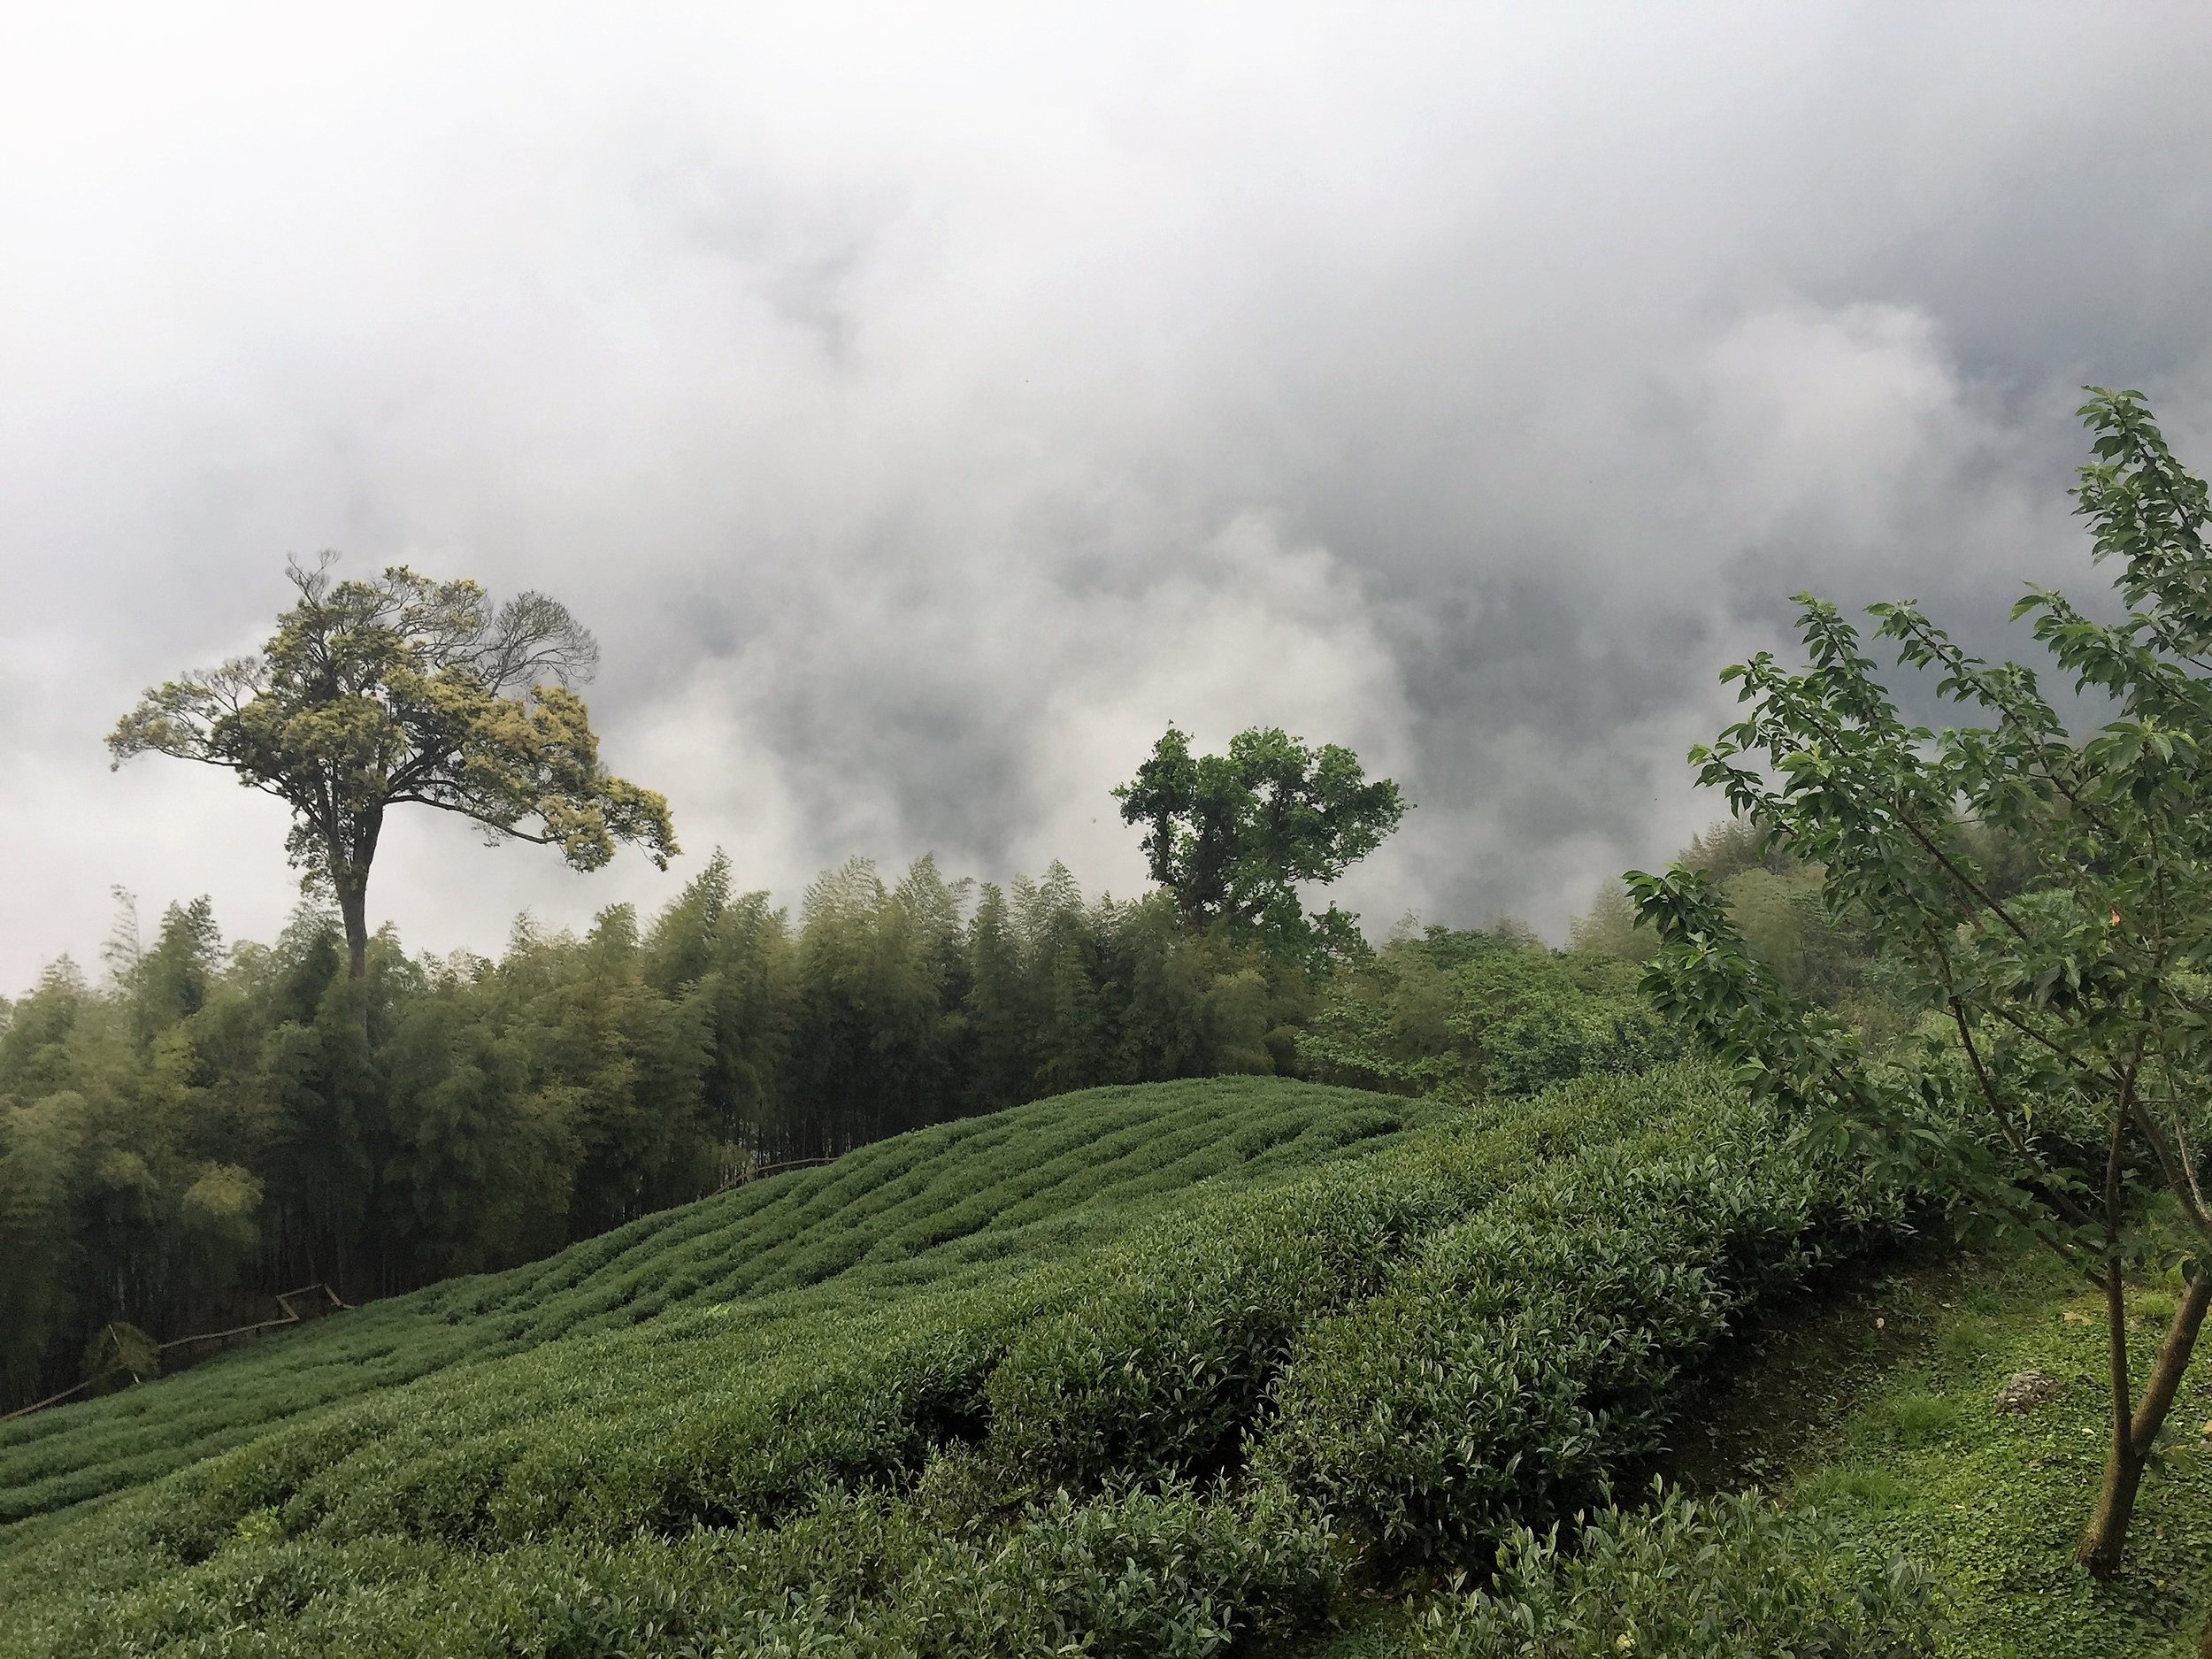 A serene tea field on Bamboo Mountain in Taiwan, 2016